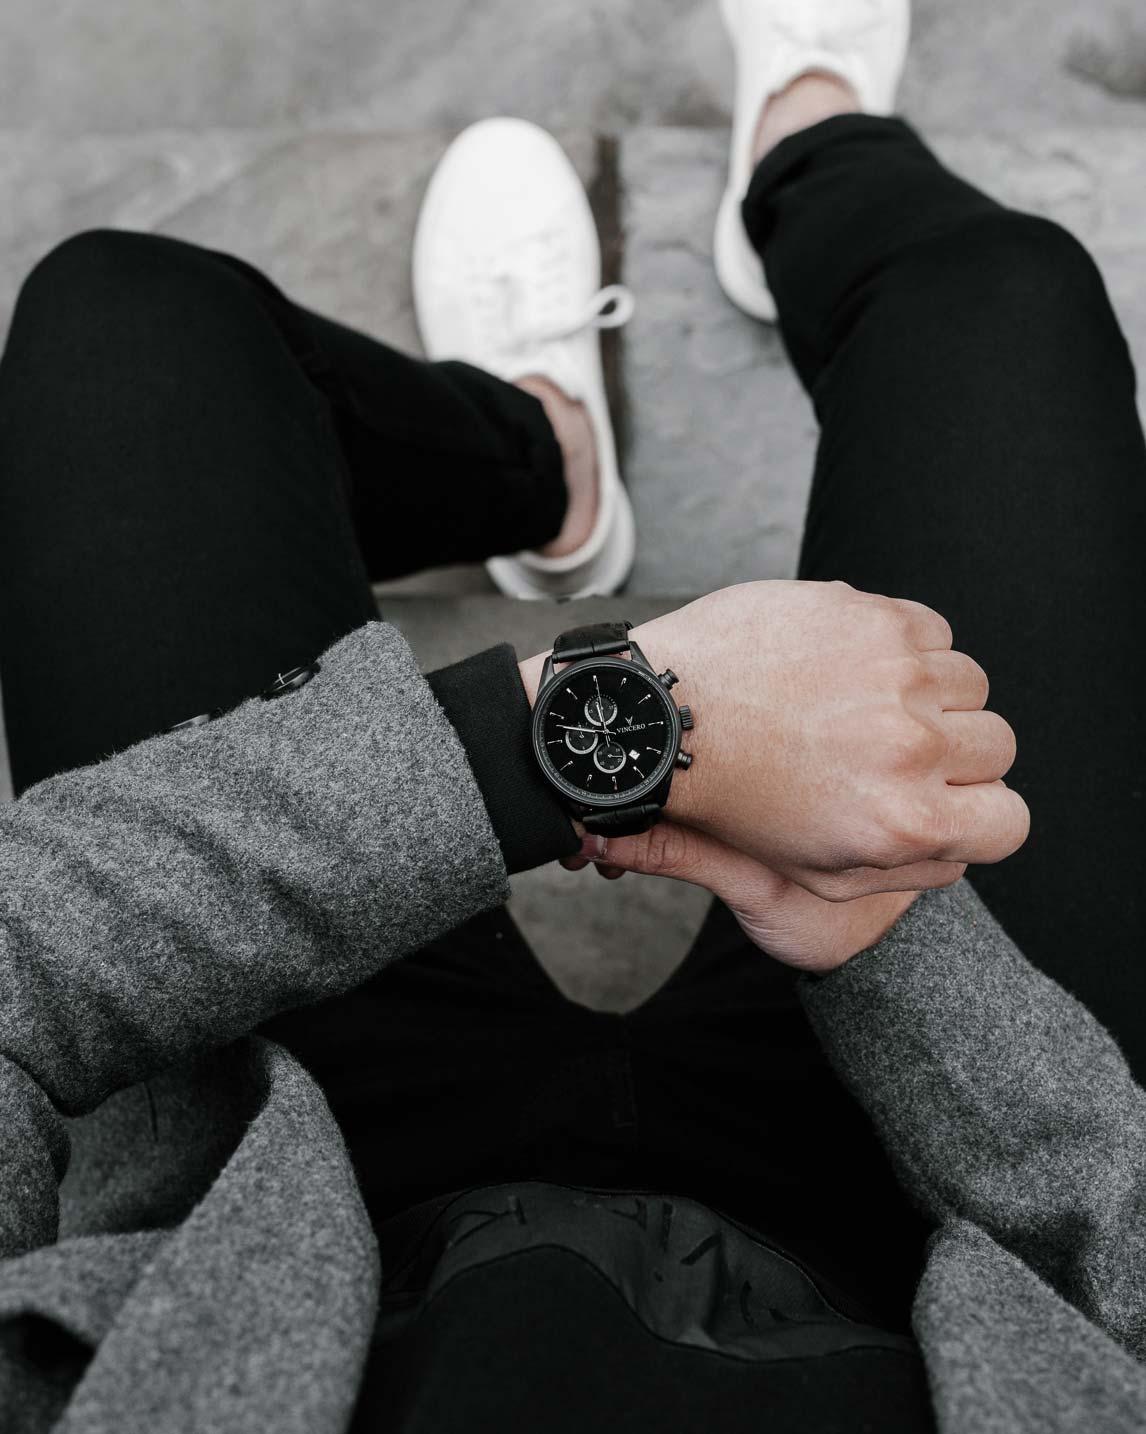 vincero-chrono-s-matte-black